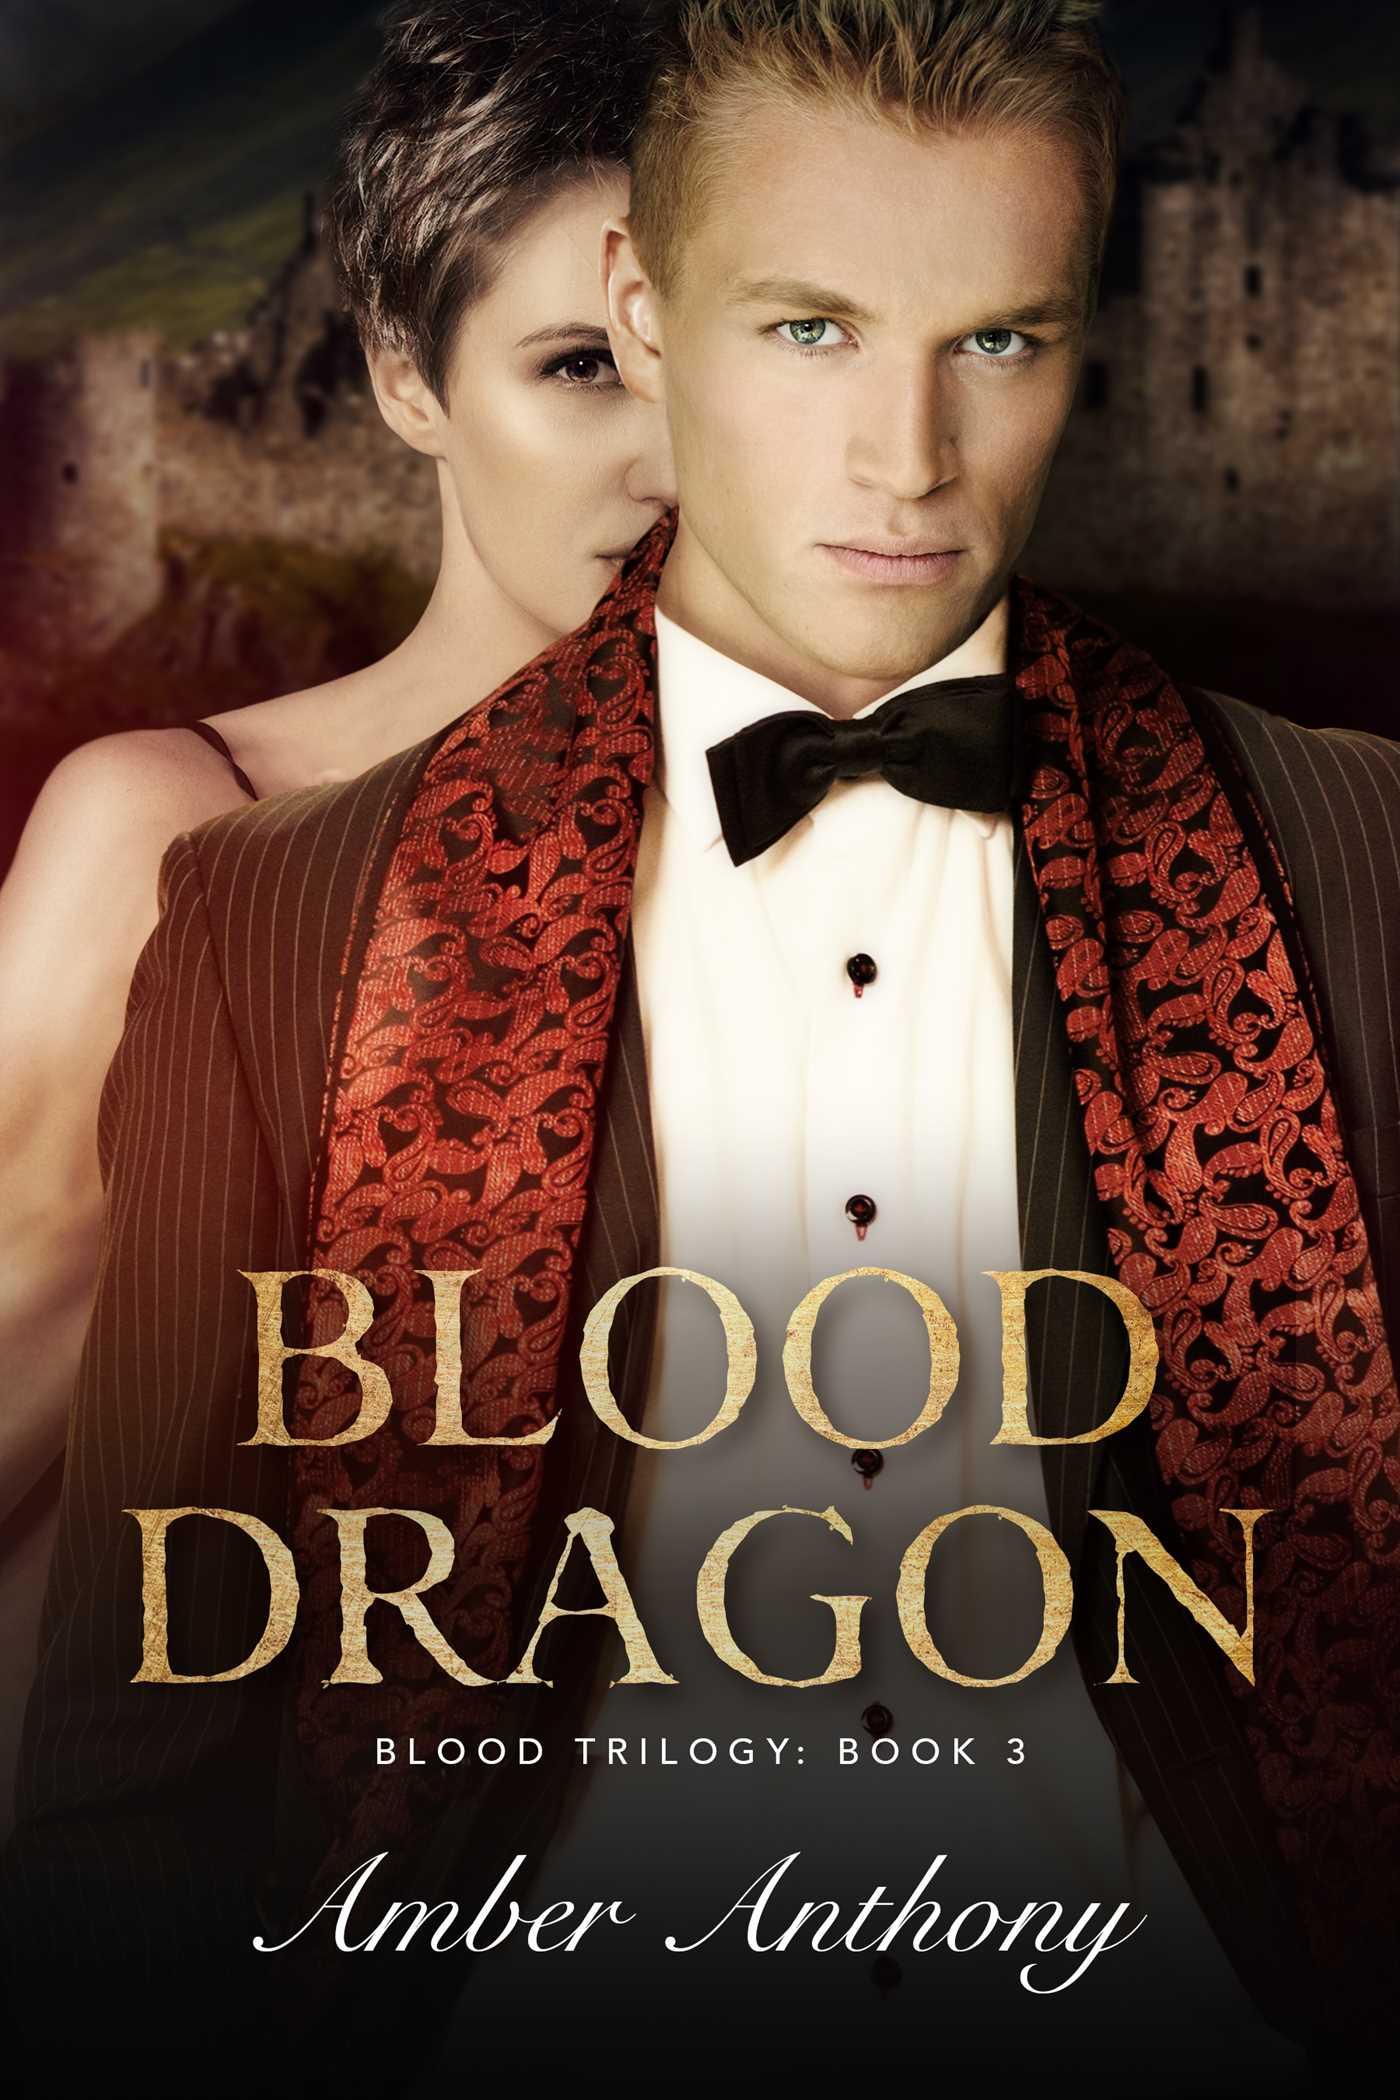 Blood dragon 9781682992906 hr